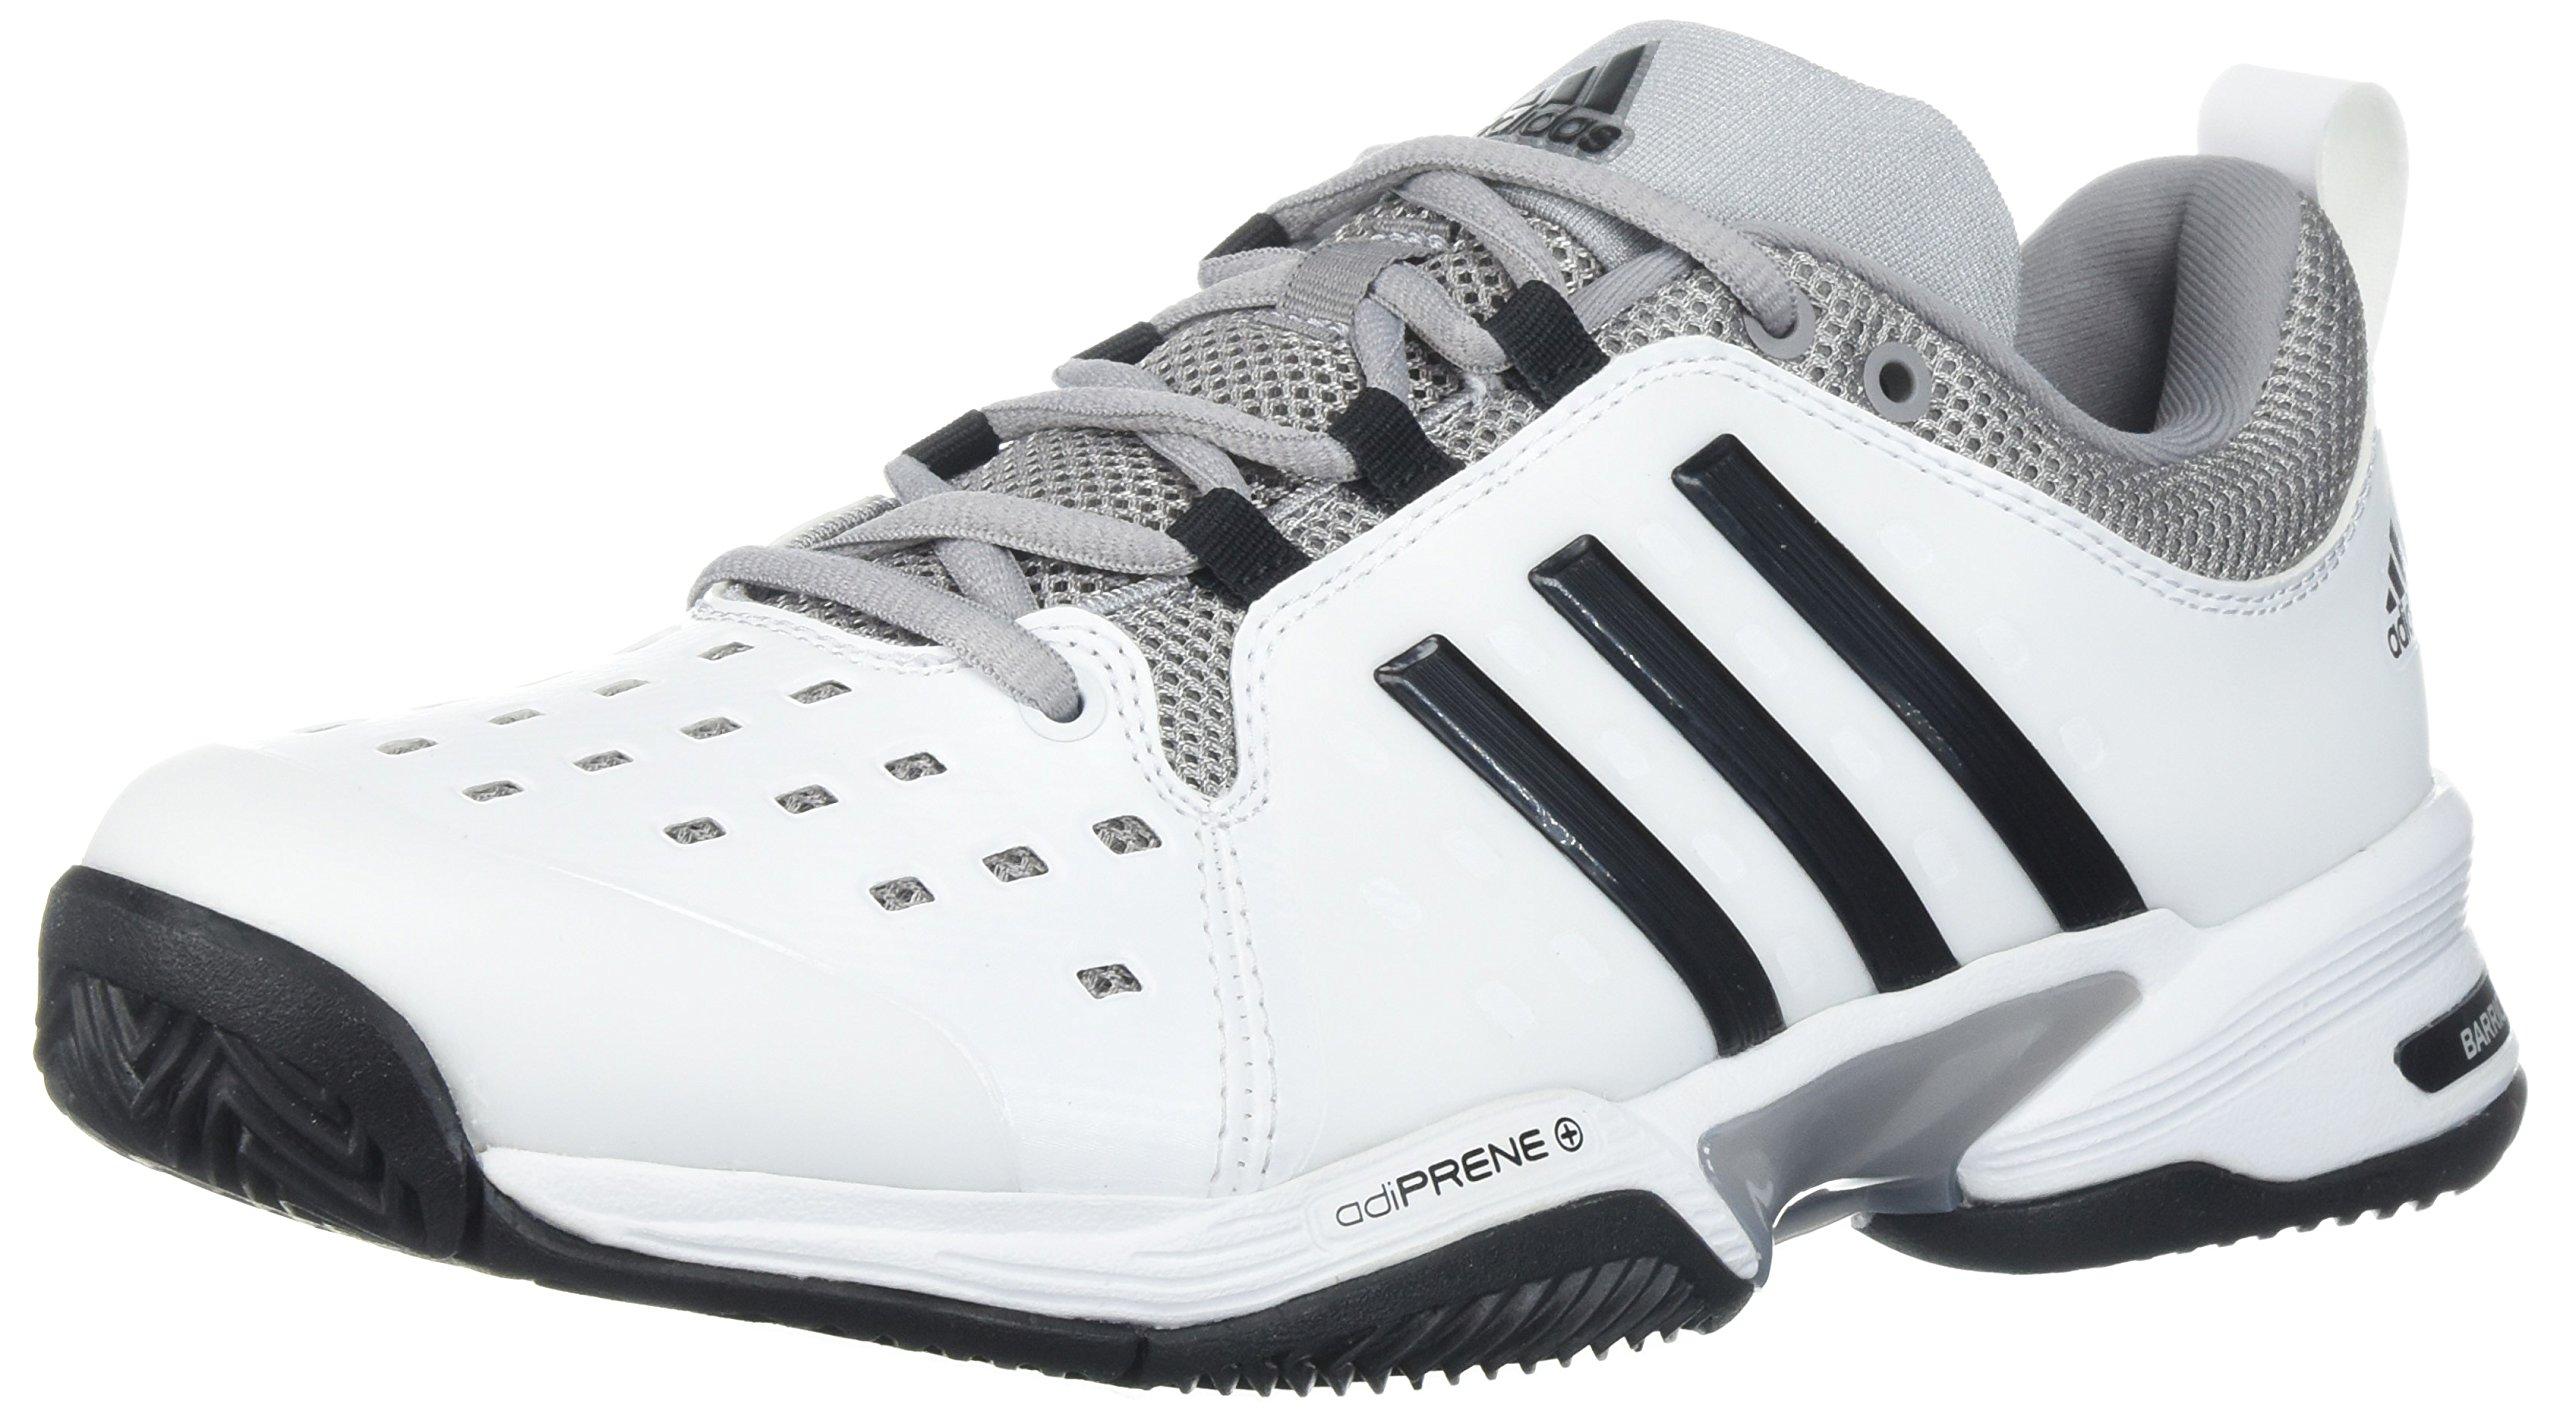 adidas  Barricade Classic Wide 4E Tennis Shoe,white/black/mid grey,14 US by adidas